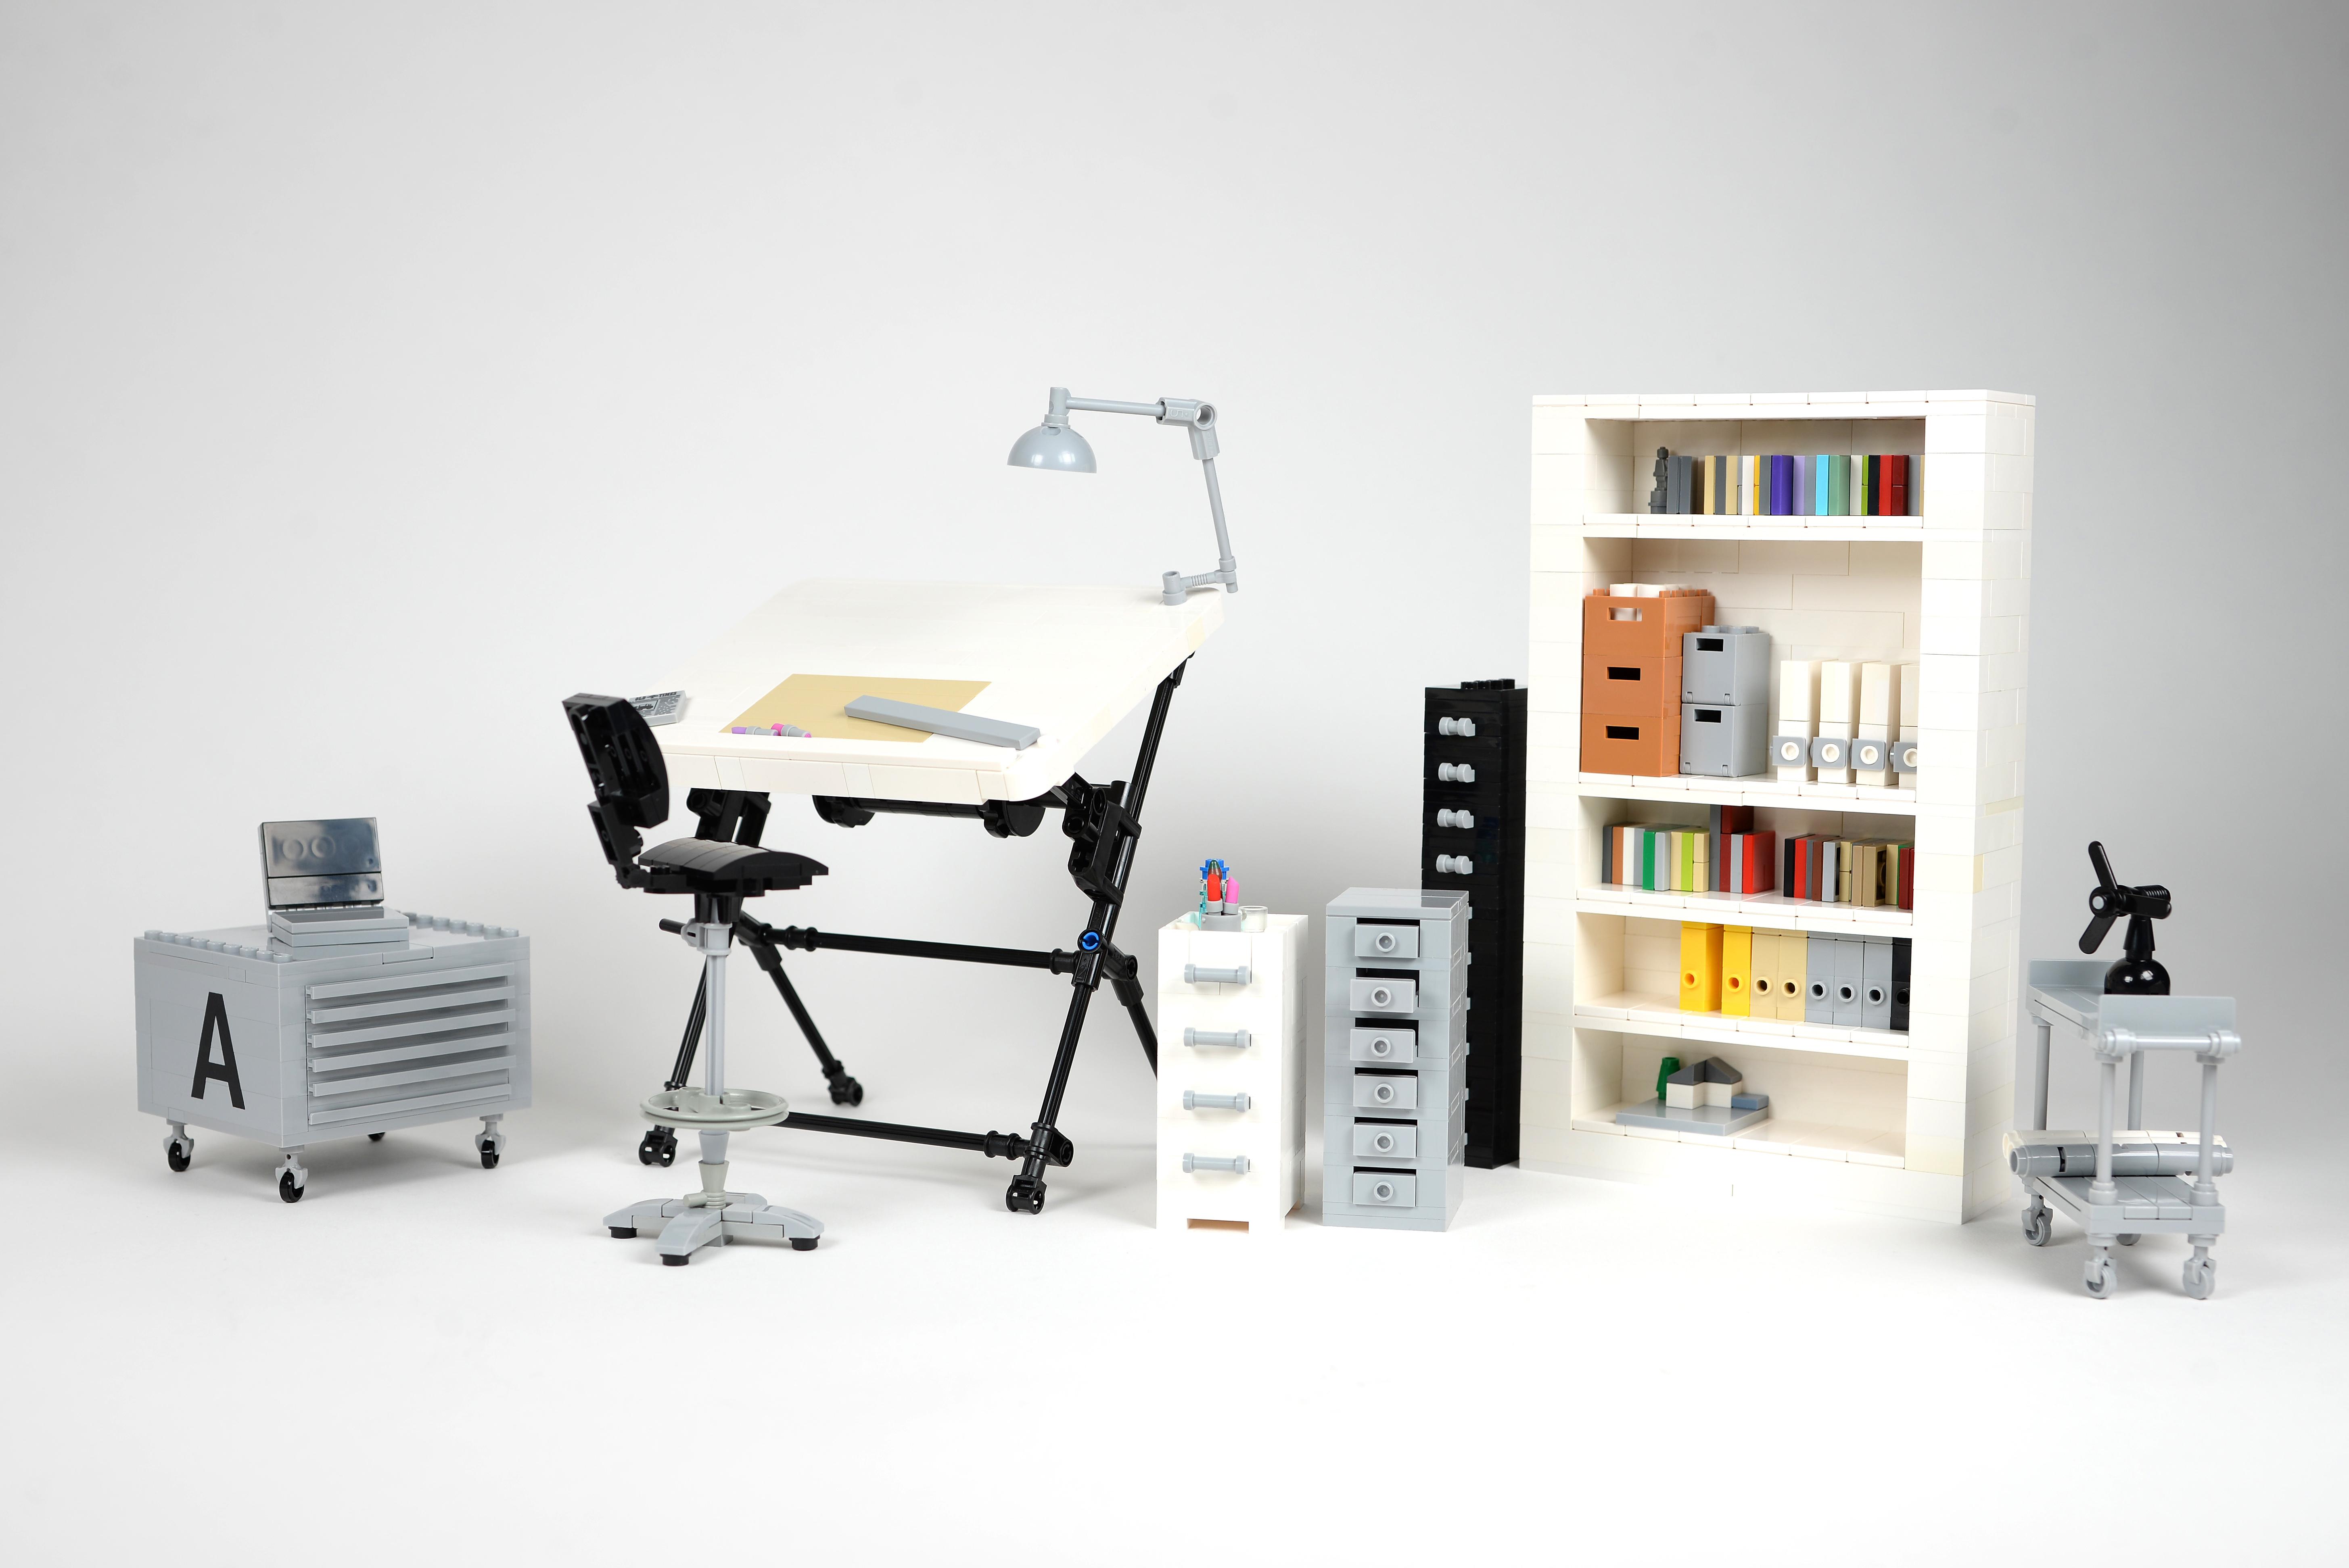 Licht Büro hintergrundbilder tabelle lego kaffee sessel büro regal